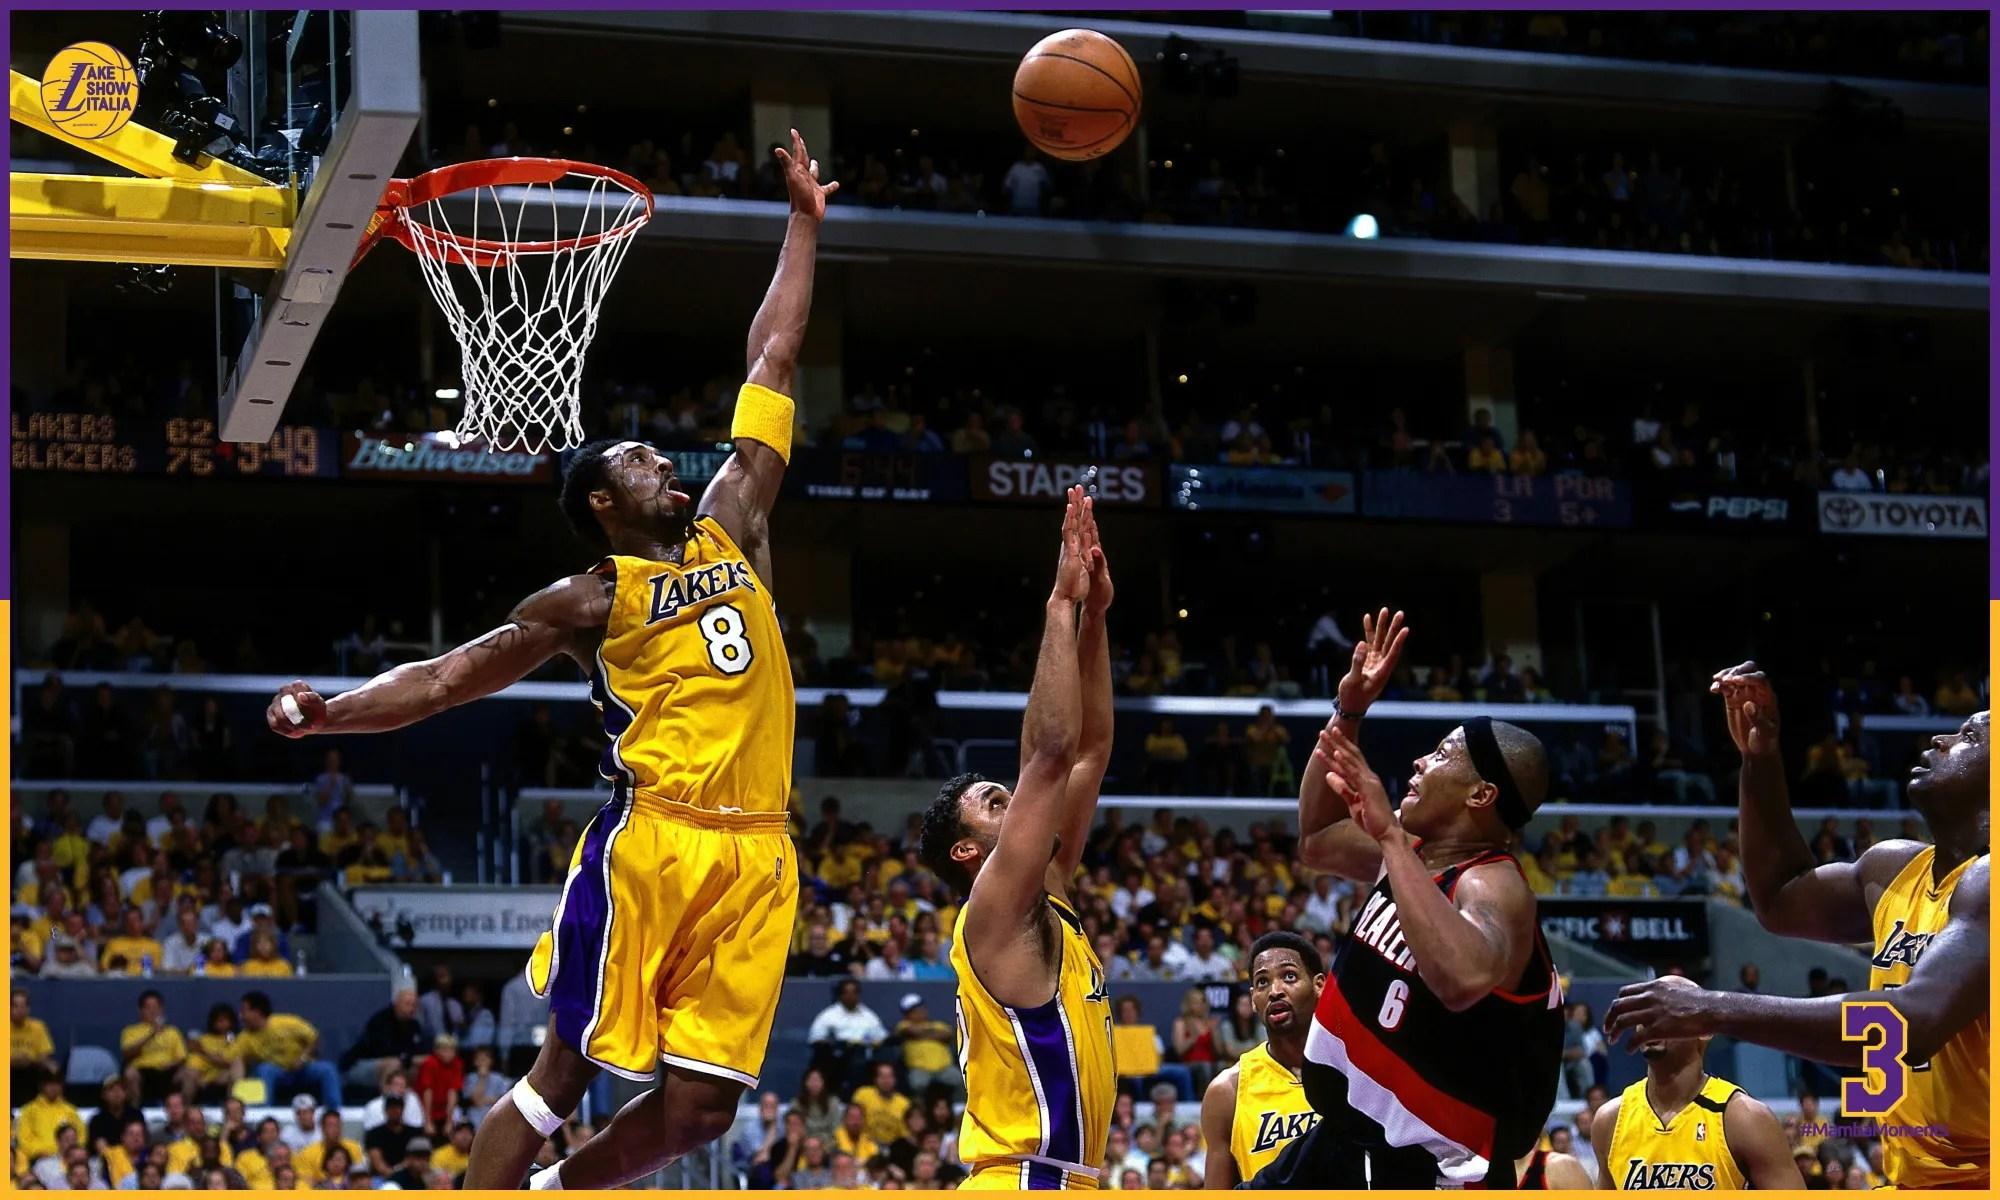 Kobe Bryant and Bonzi Wells, Los Angeles Lakers vs Portland Trail Blazers